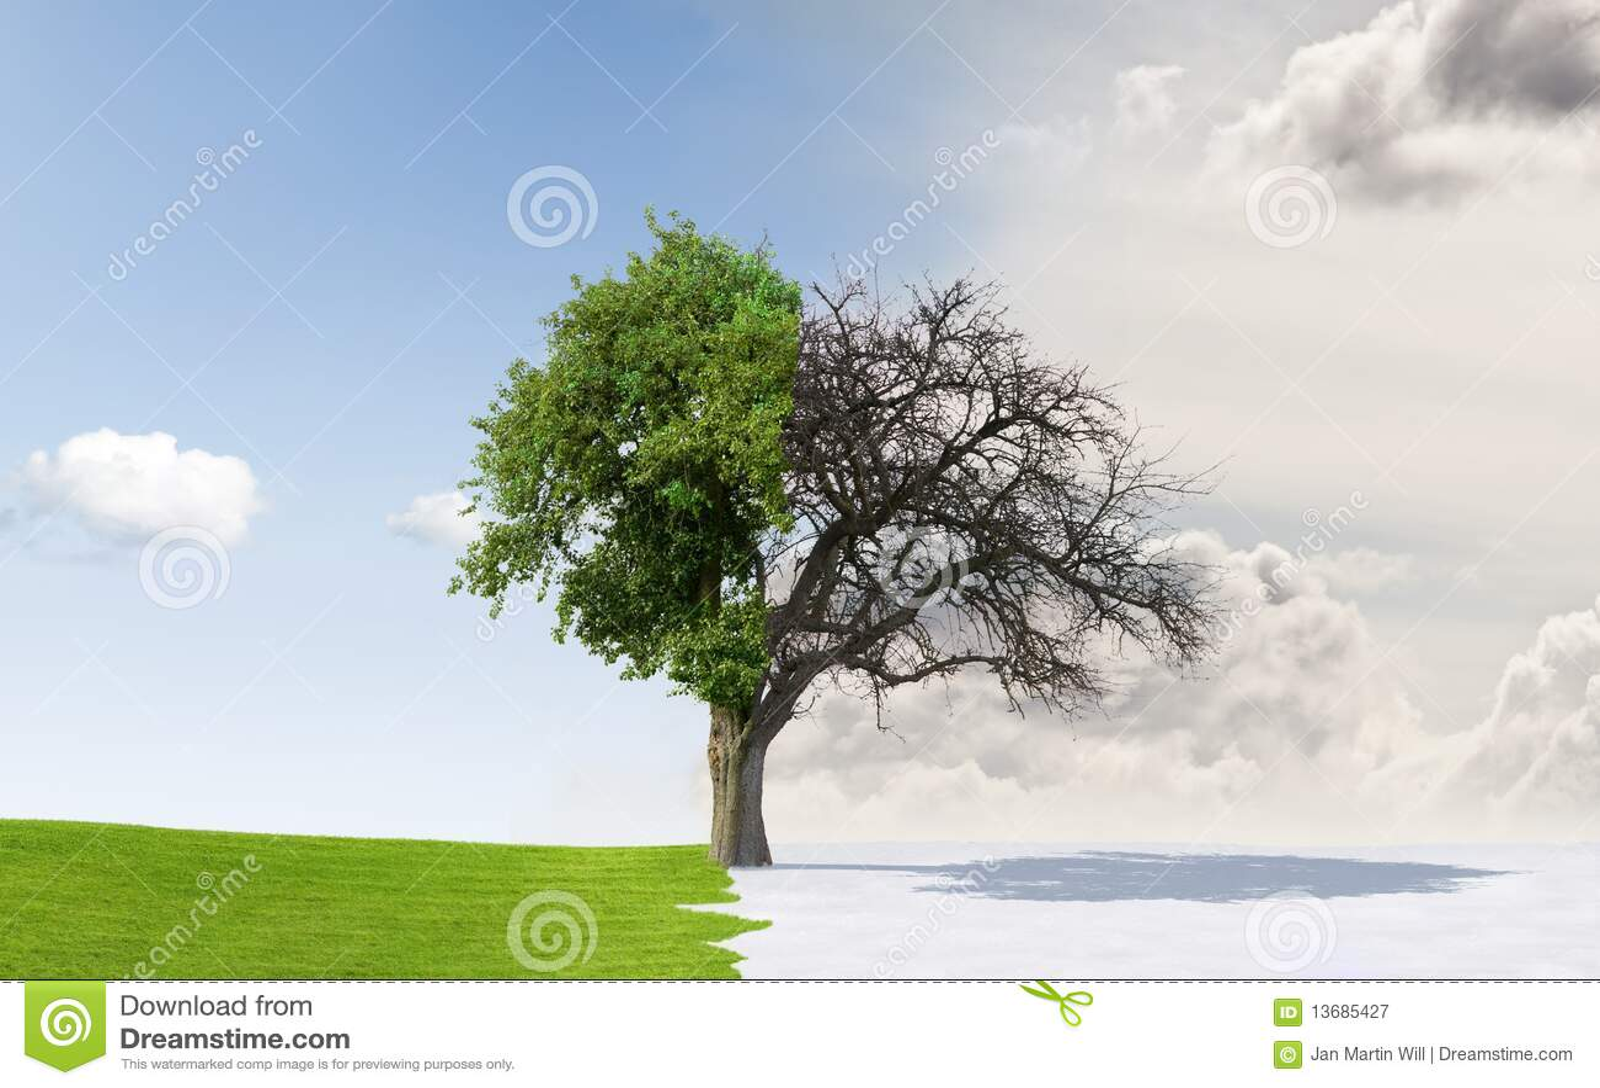 Apple Tree In Changing Seasons Stock Image